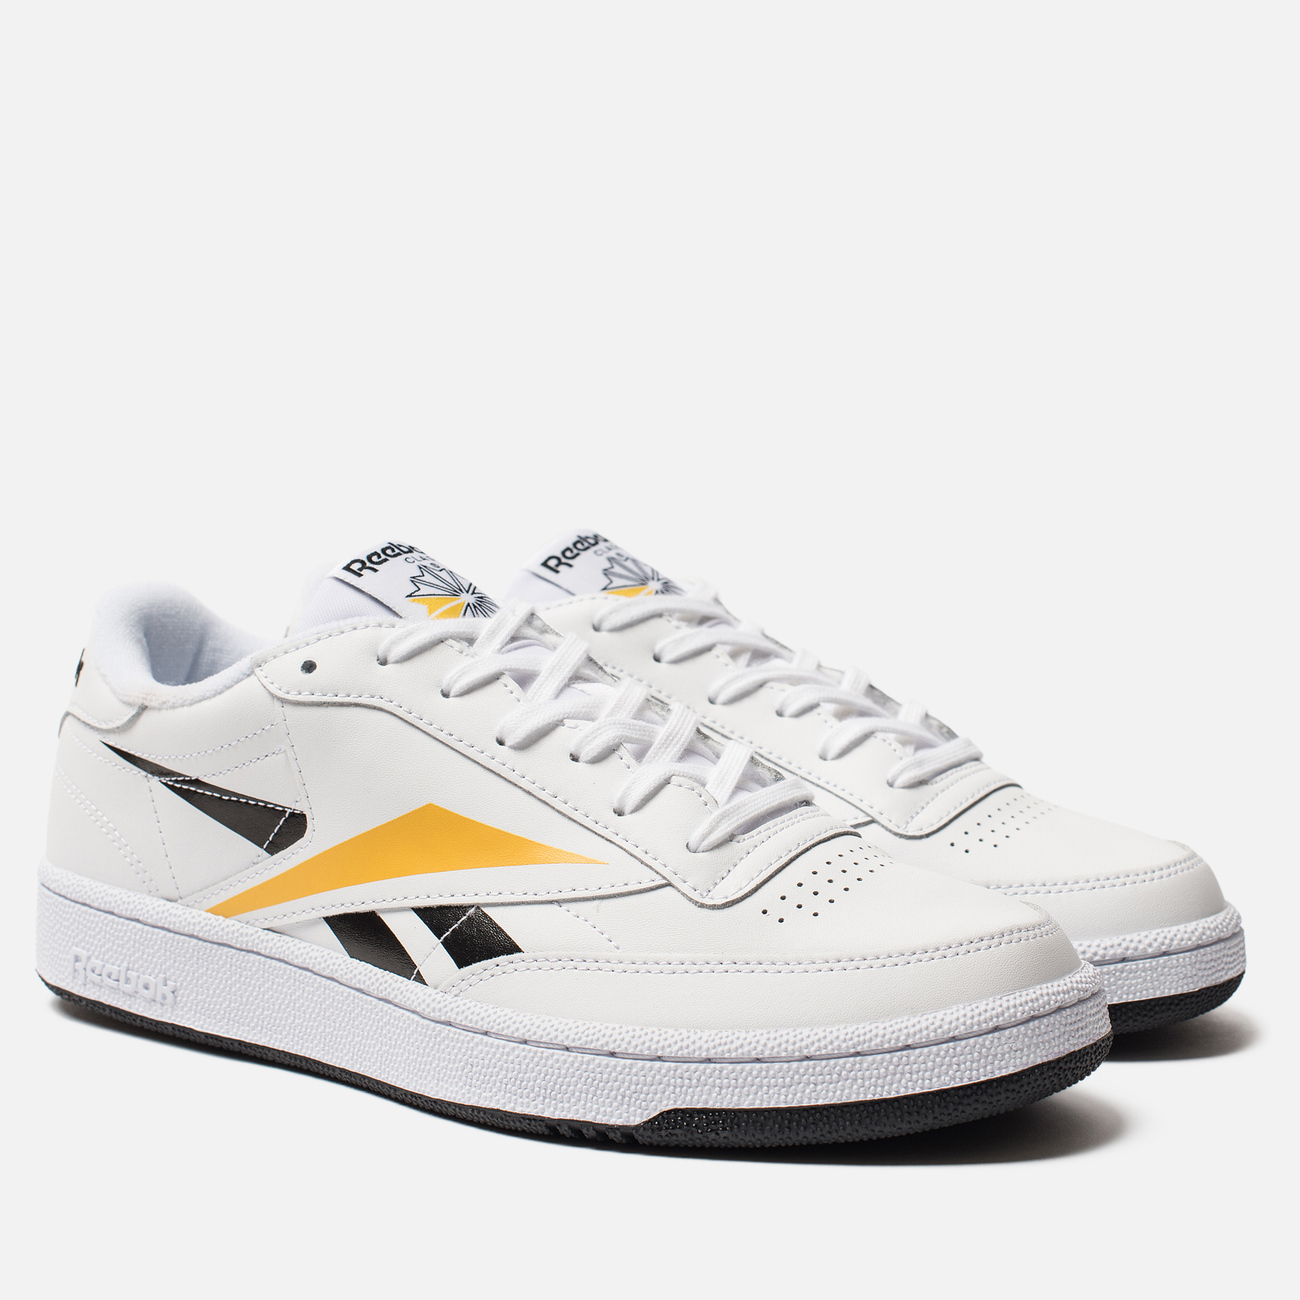 Мужские кроссовки Reebok Club C 85 MU White/Black/Toxic Yellow